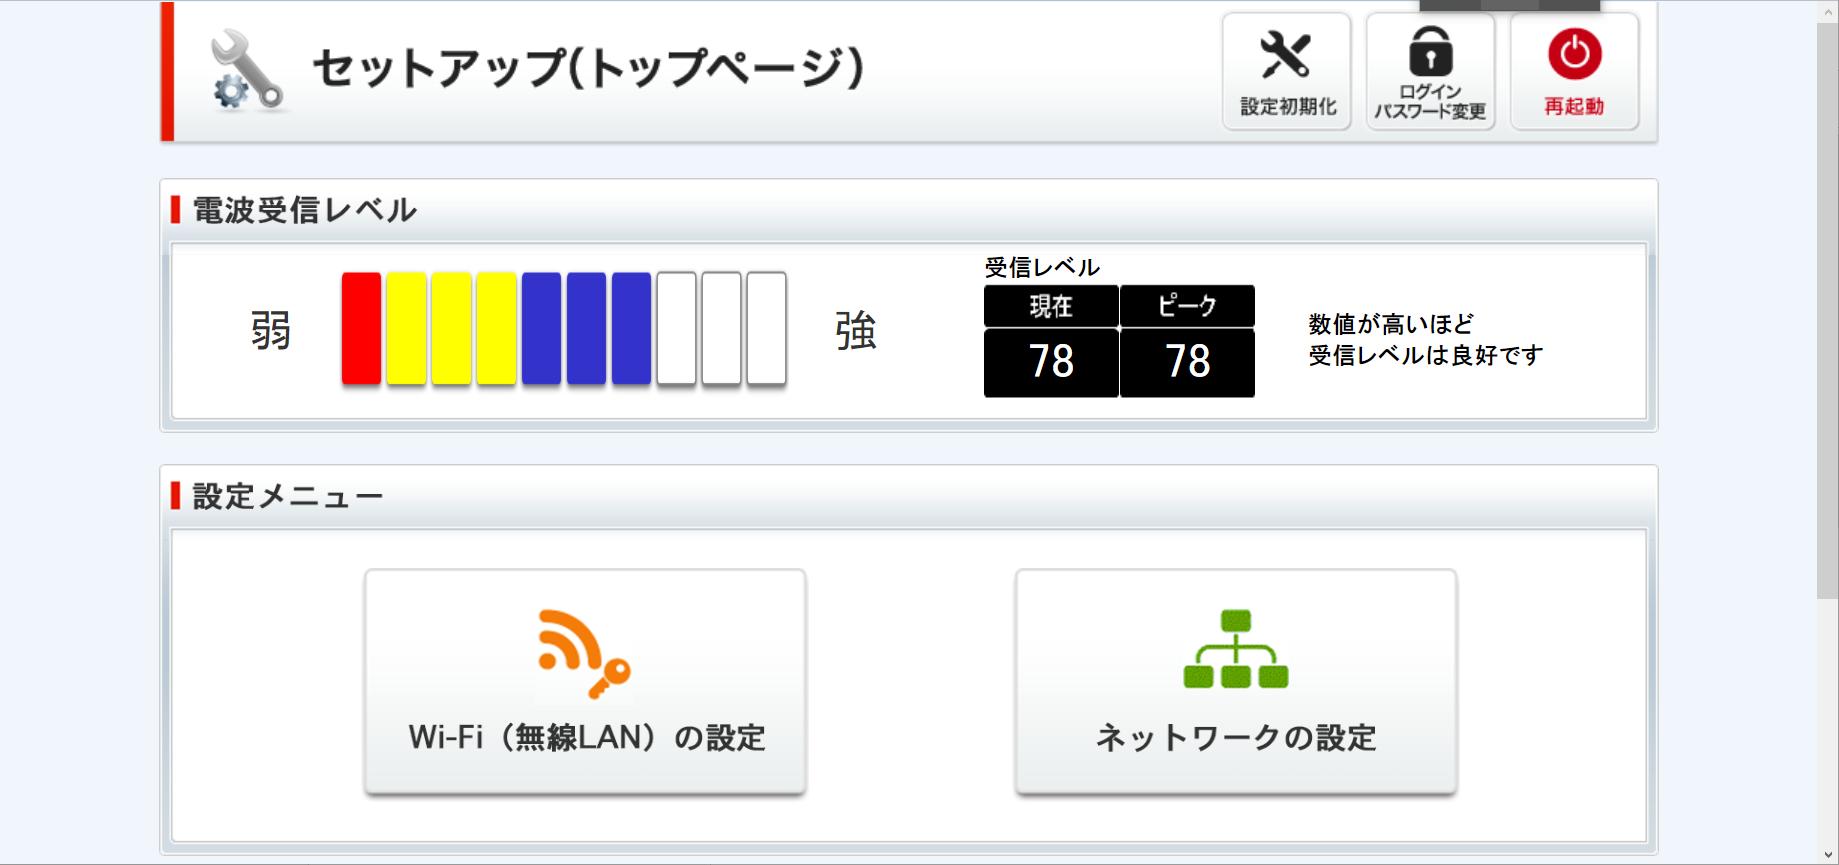 Softbank Air: Wifi ネットワークの暗い闇、シェアード IP_a0056607_13025934.png